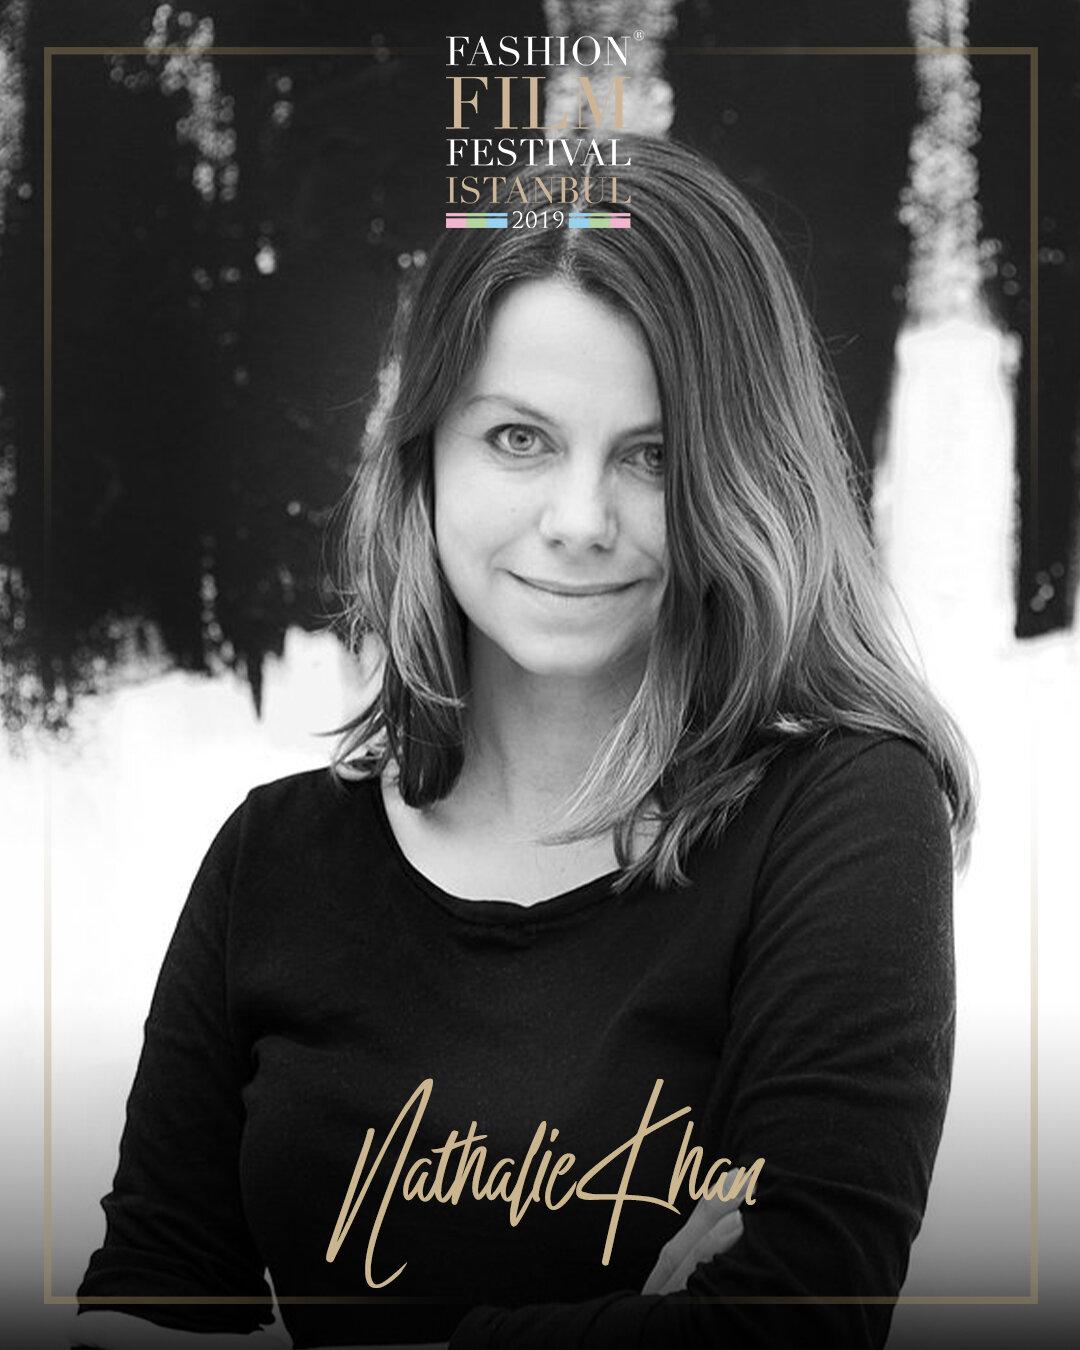 Nathalie Khan    Fashion Historian    Central Saint Martins